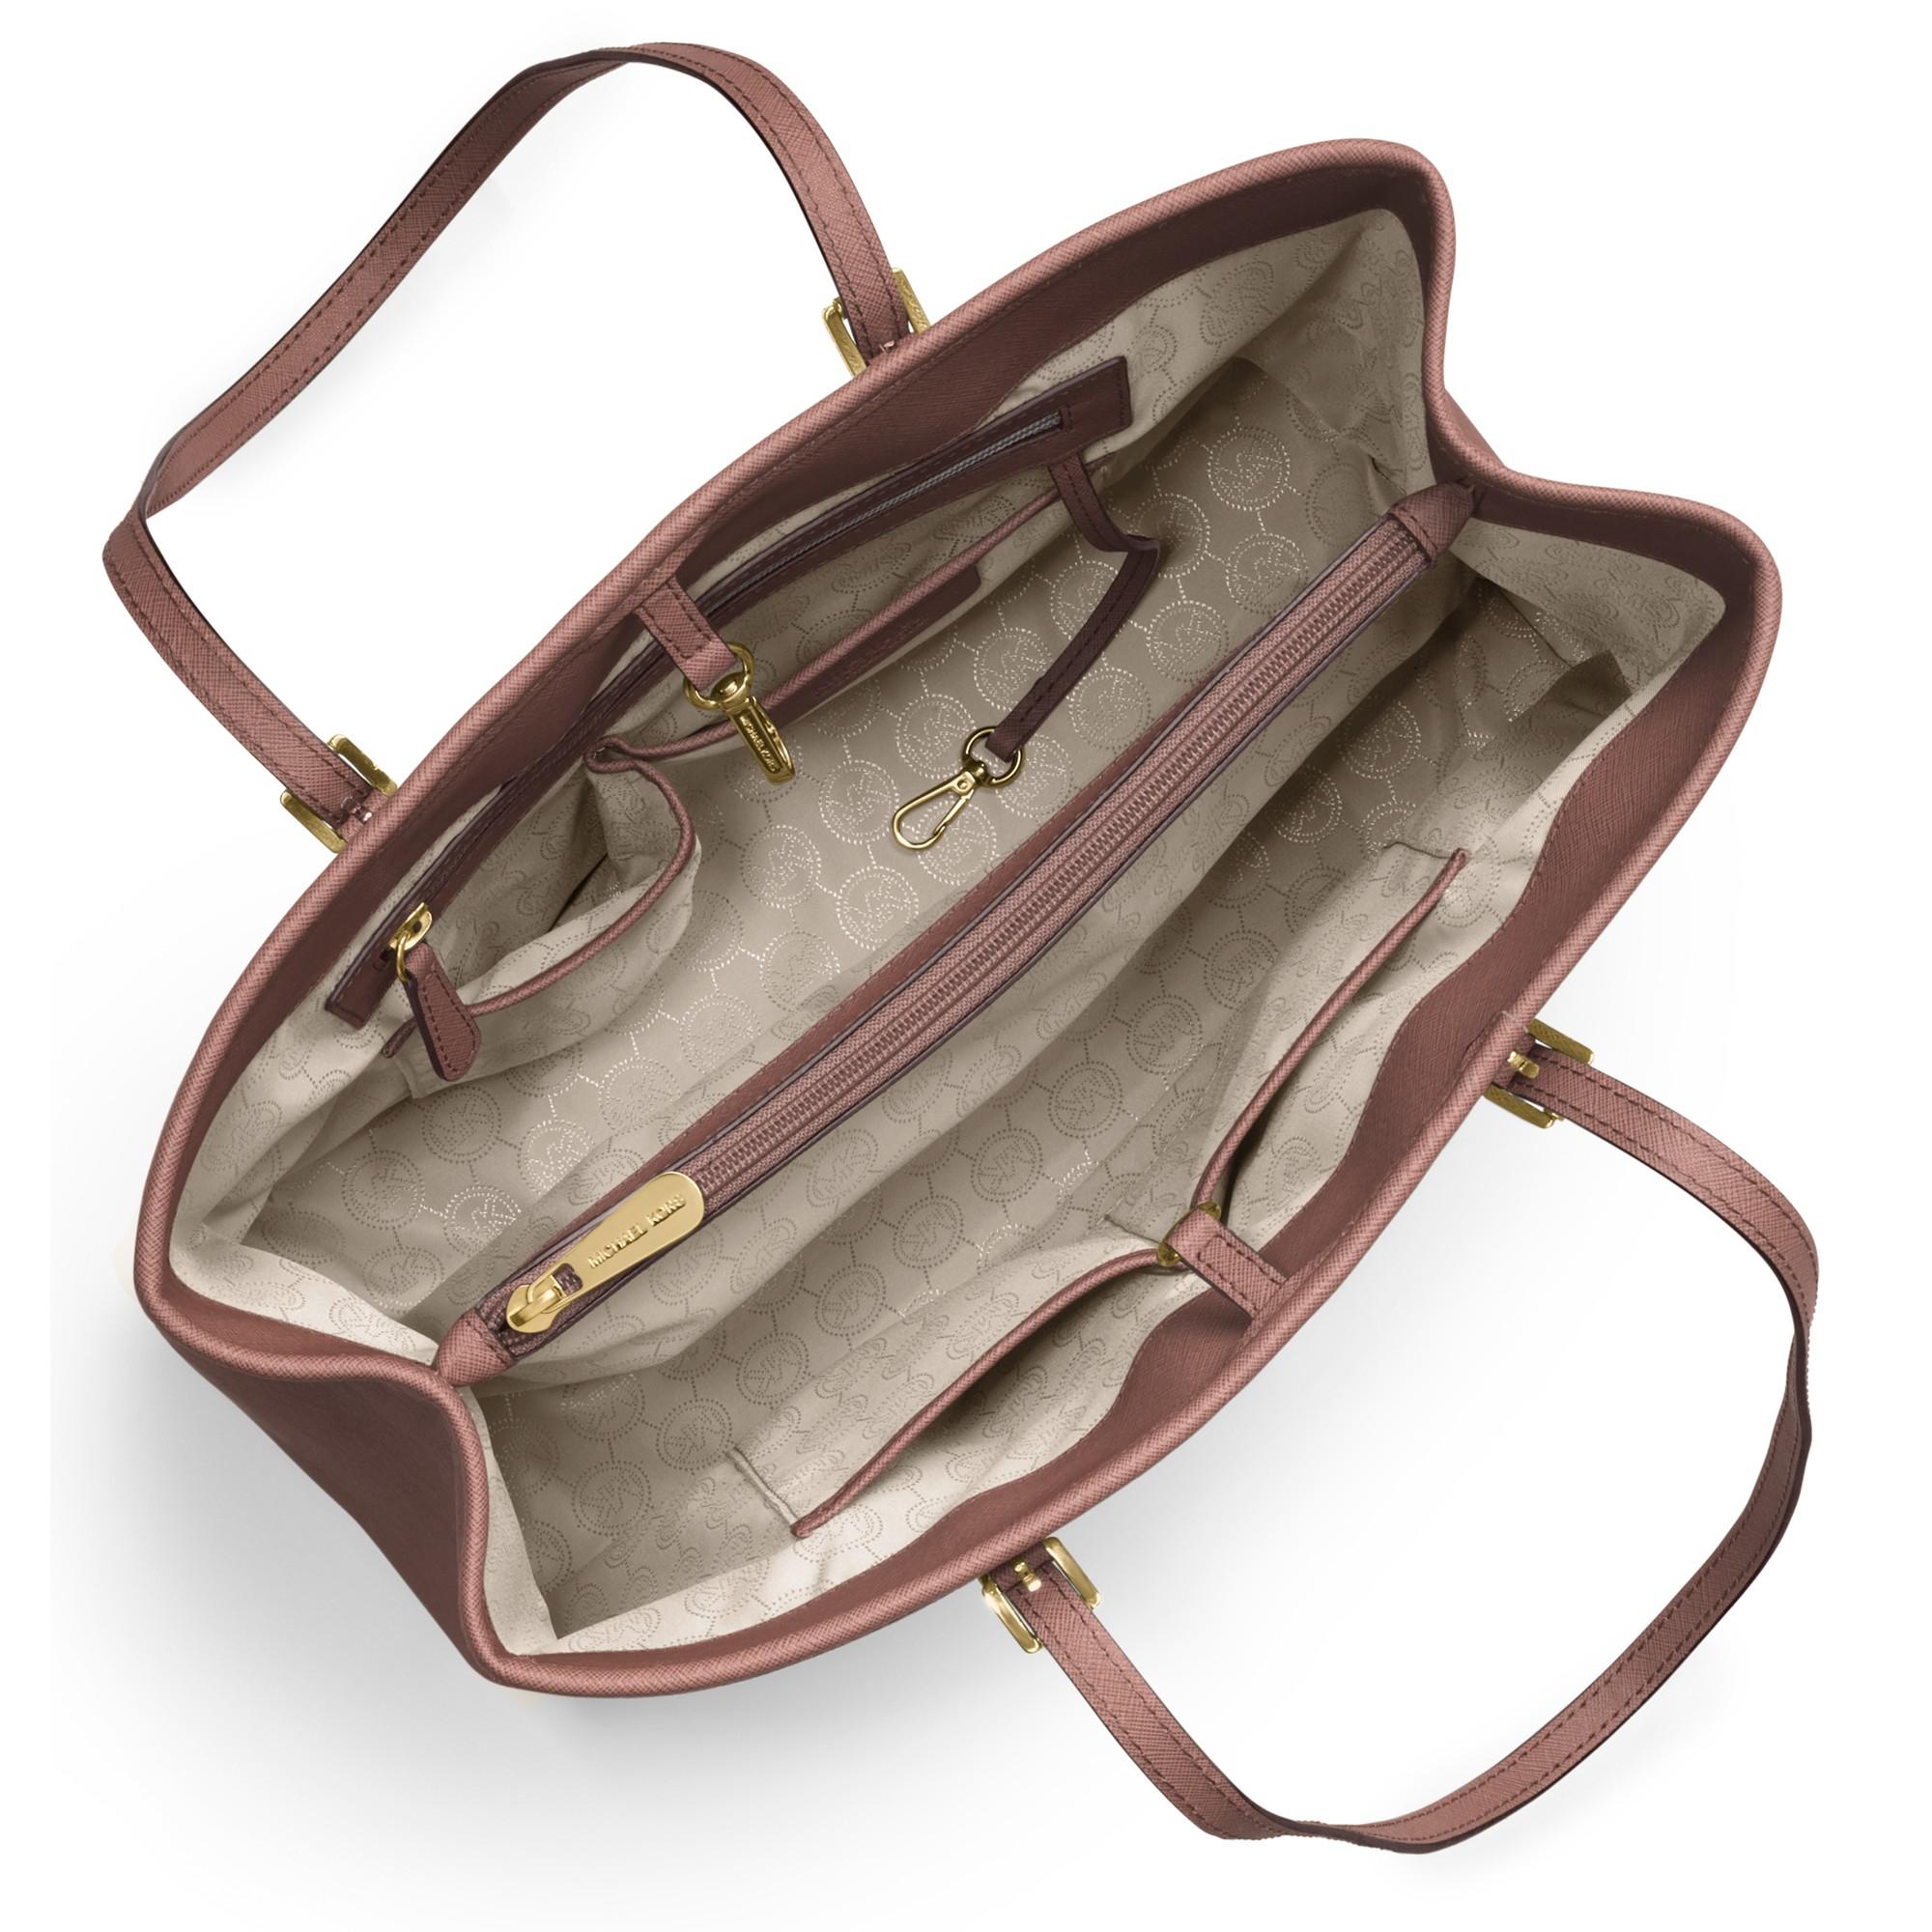 MICHAEL Michael Kors Jet Set East west Large Leather Tote Bag in ... 4fe63696d811d